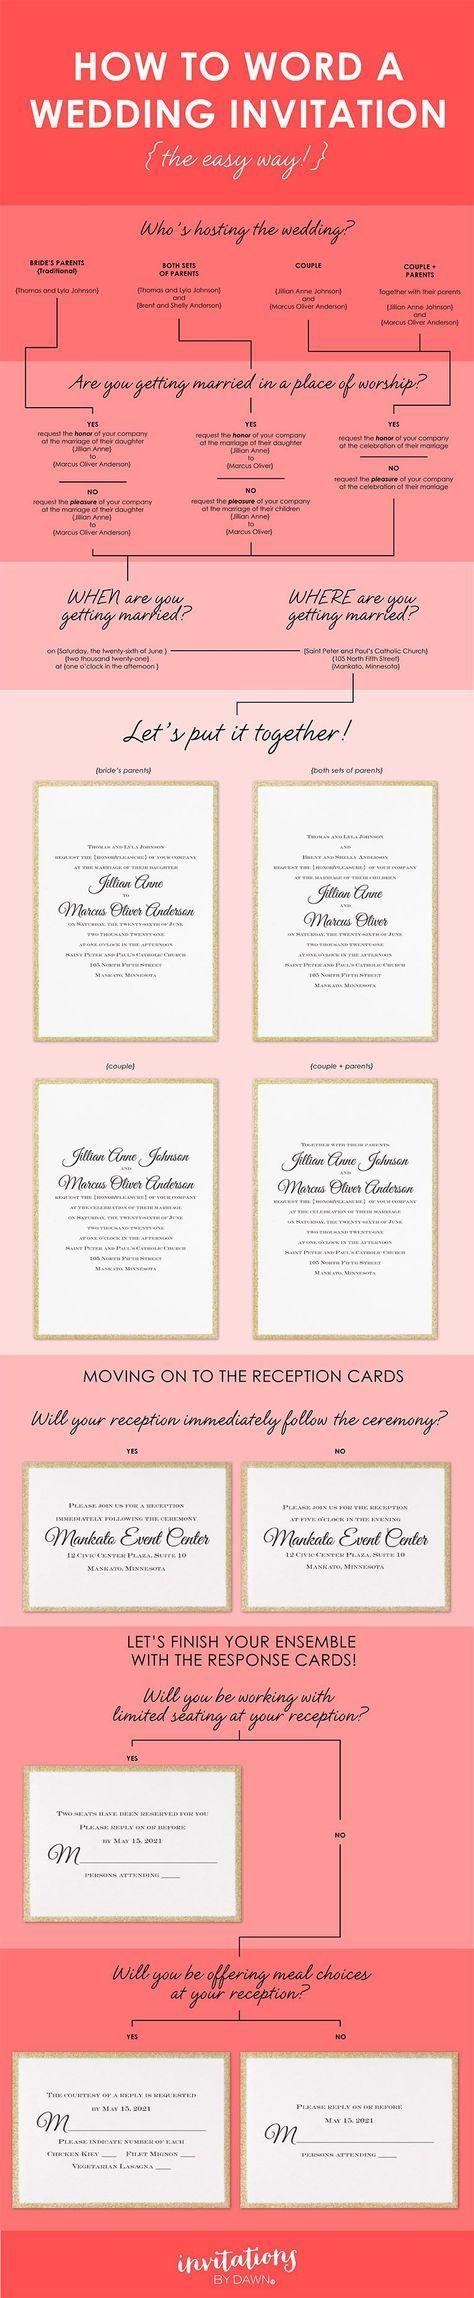 wedding invitation wording wedding invitations wording nice wedding invitations wording best photos